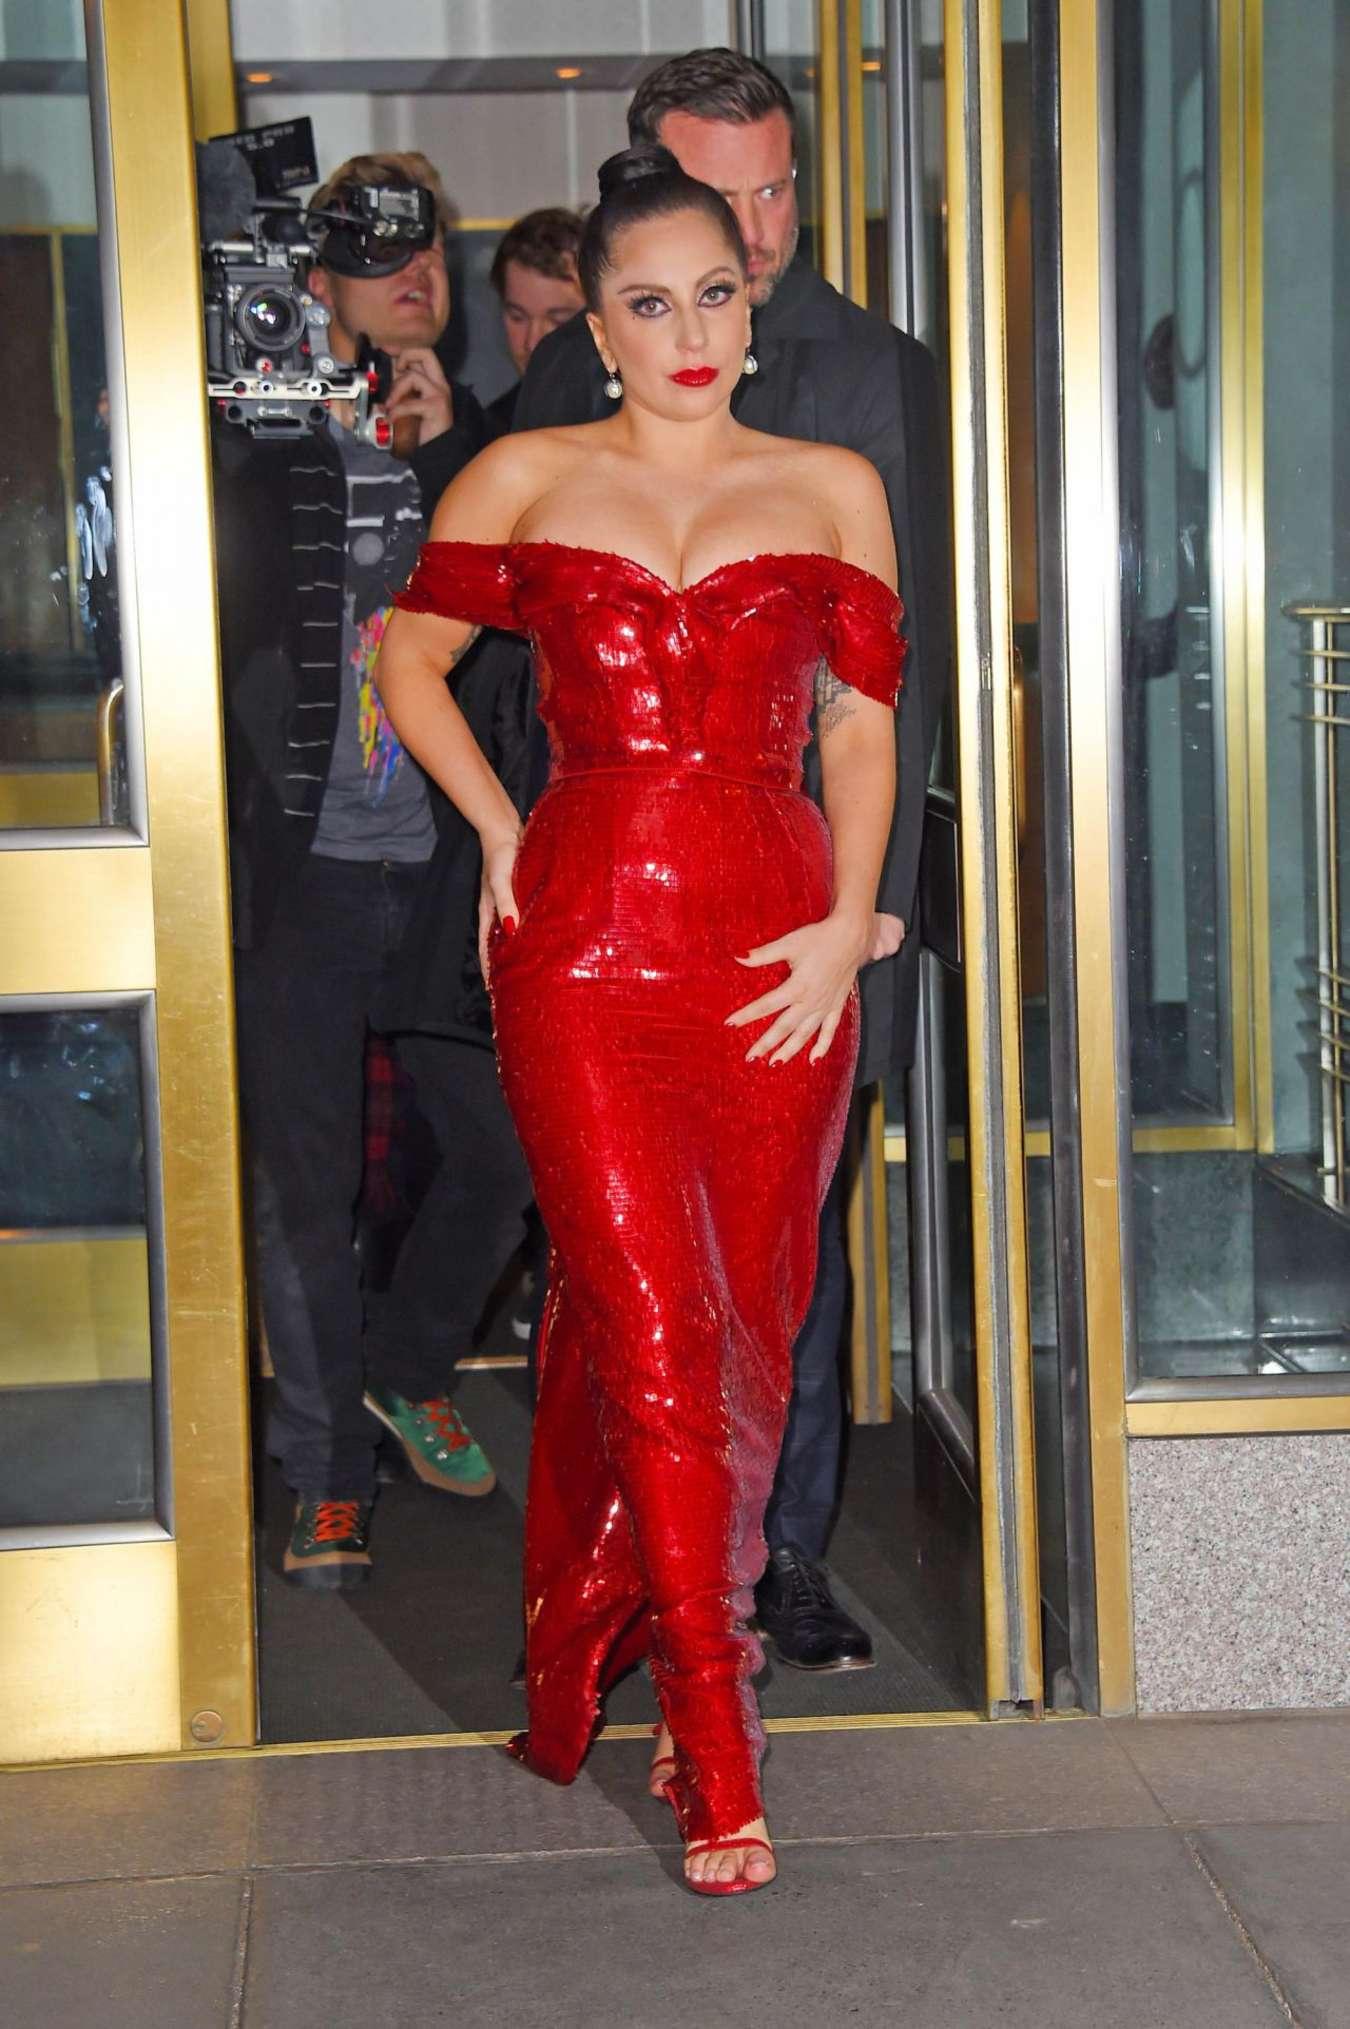 lady gaga red dress all dress. Black Bedroom Furniture Sets. Home Design Ideas